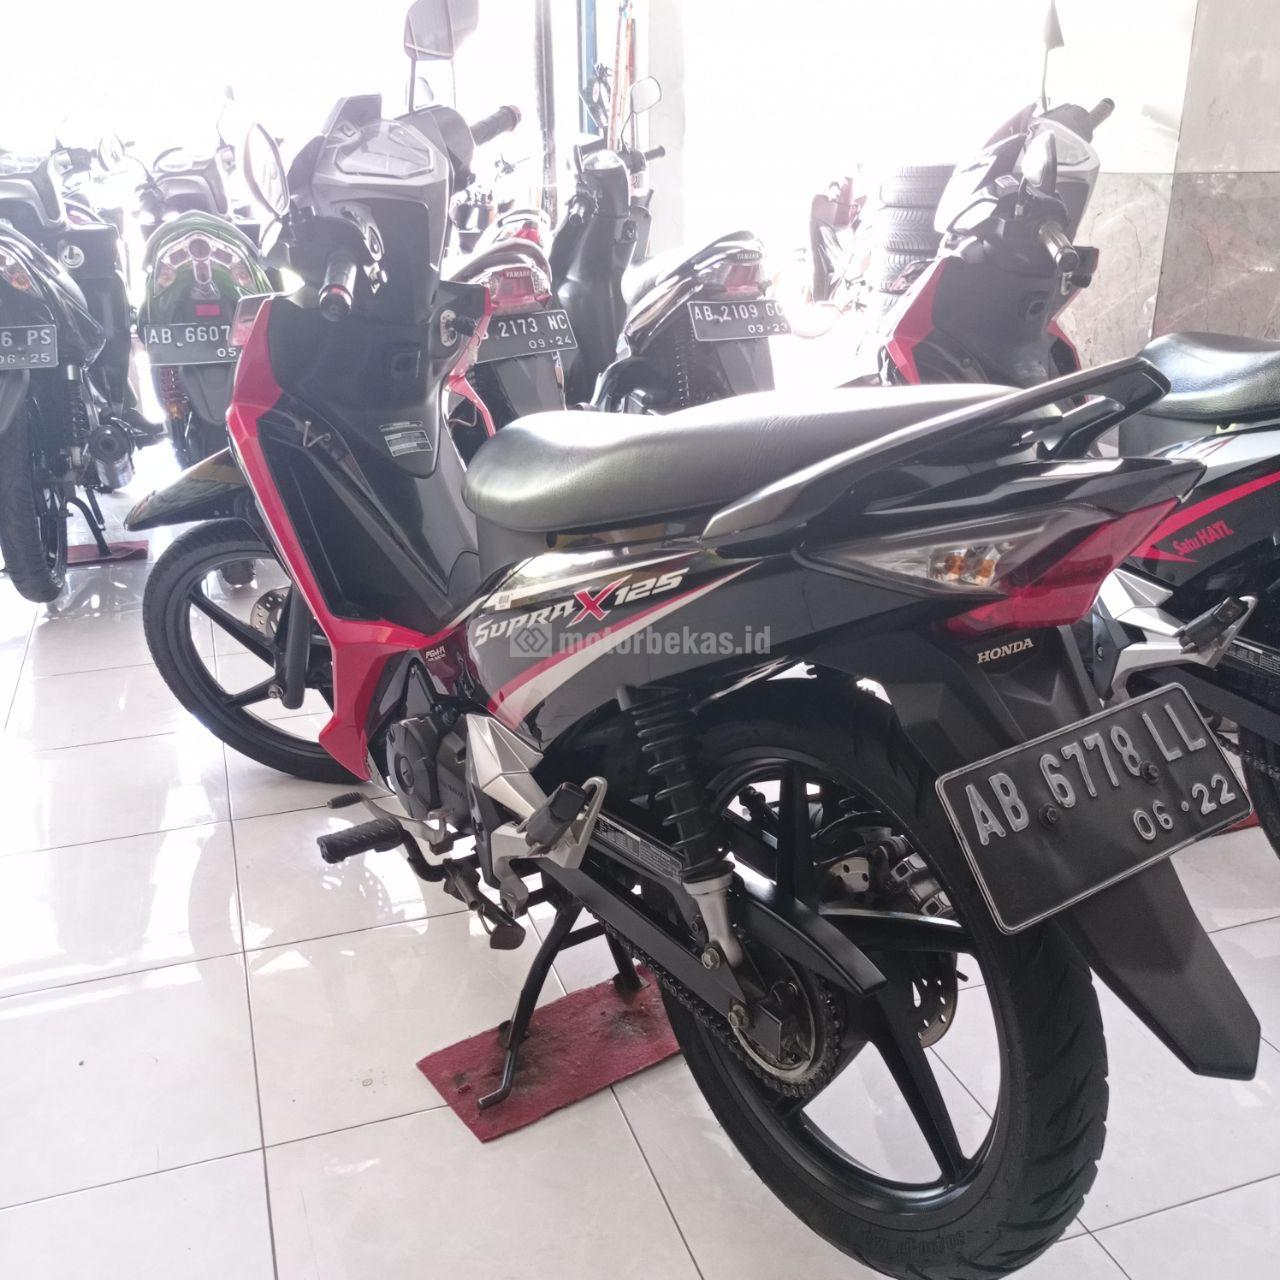 HONDA SUPRA X 125  371 motorbekas.id